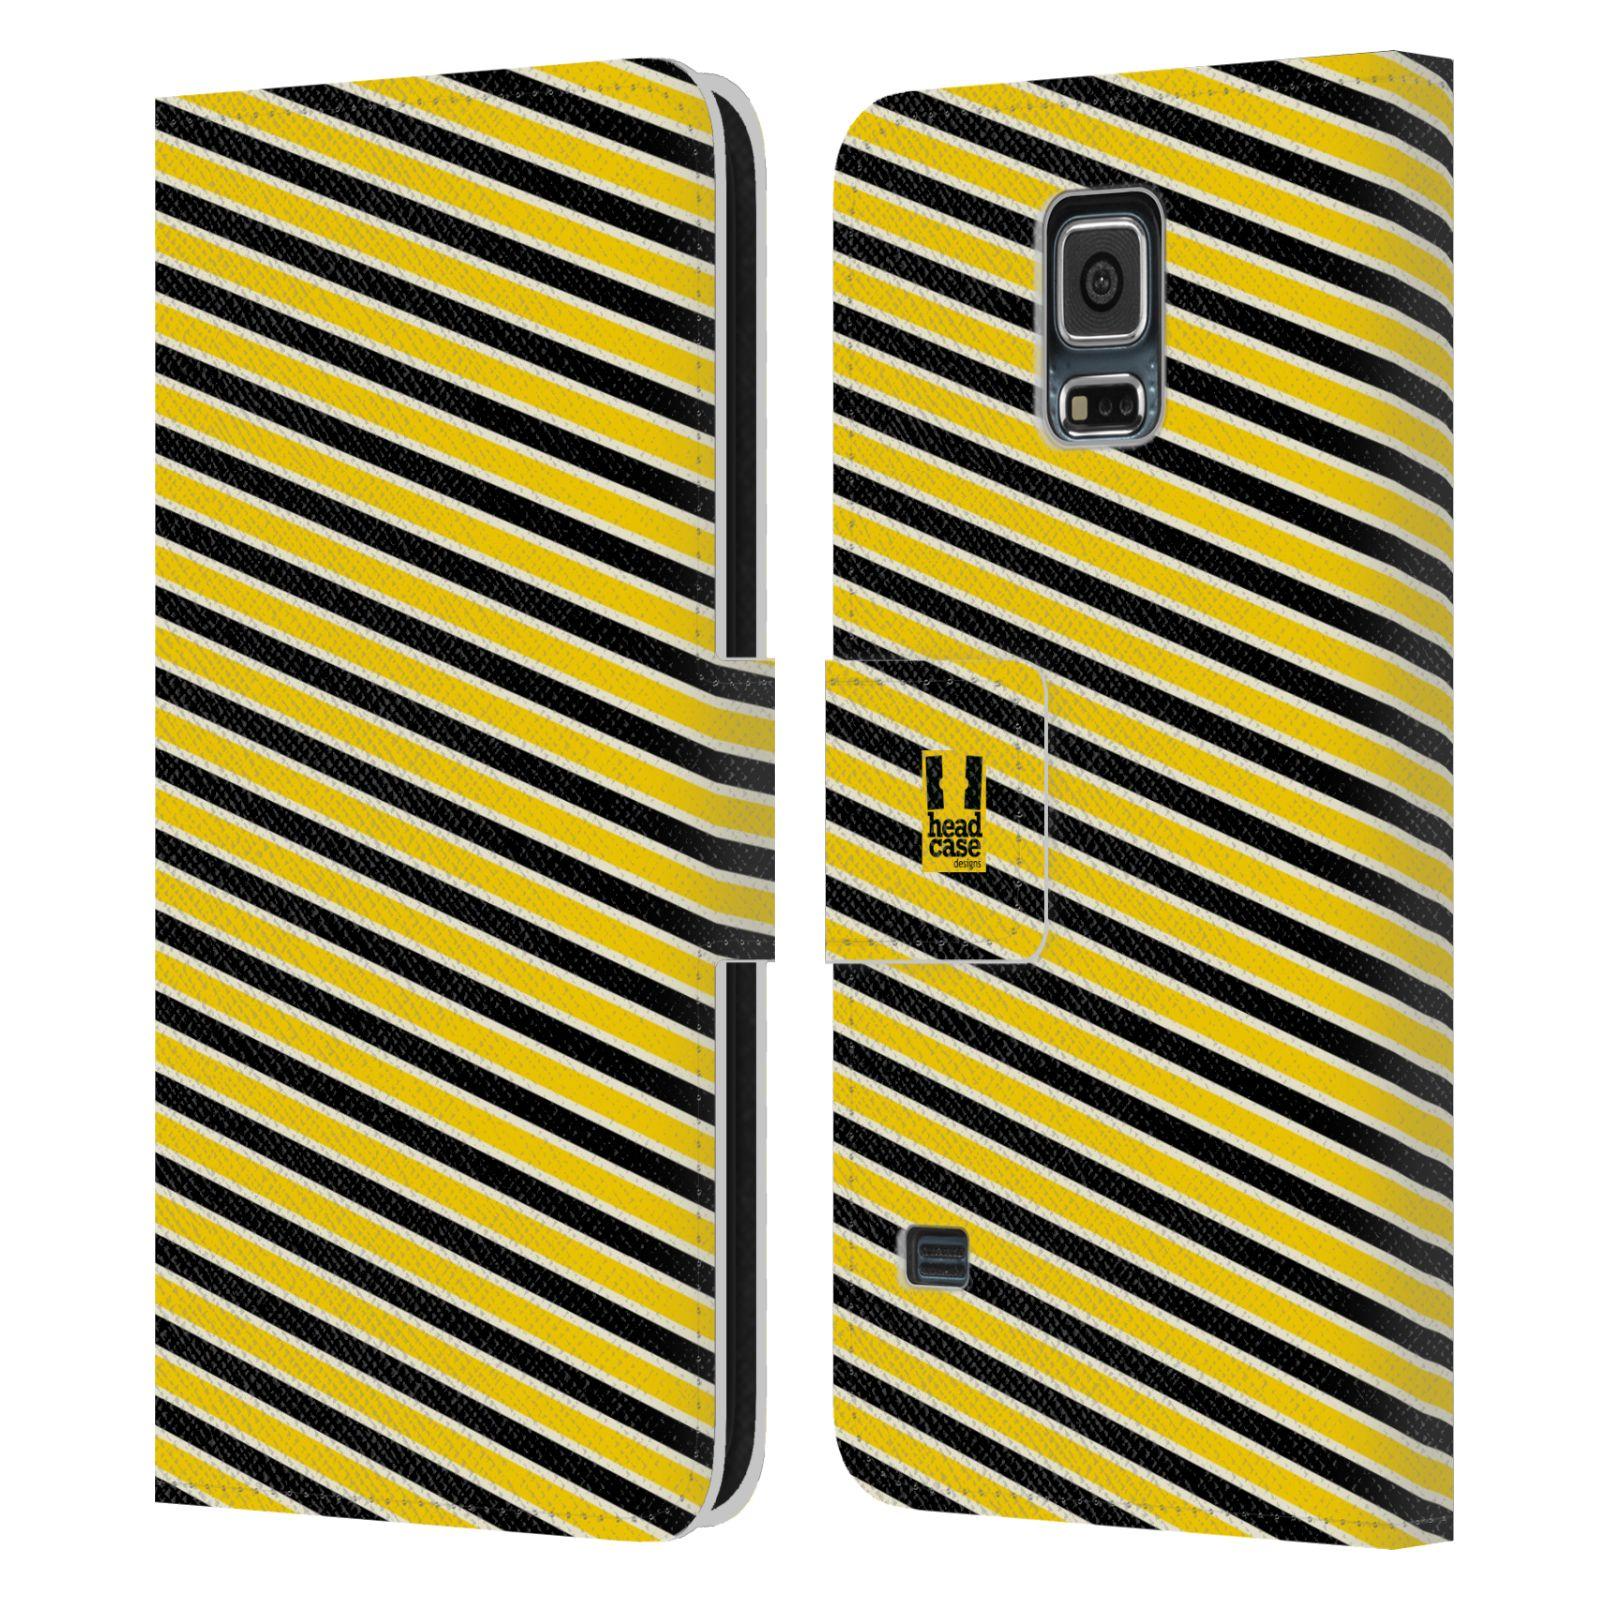 HEAD CASE Flipové pouzdro pro mobil Samsung Galaxy S5 / S5 NEO VČELÍ VZOR pruhy žlutá a černá